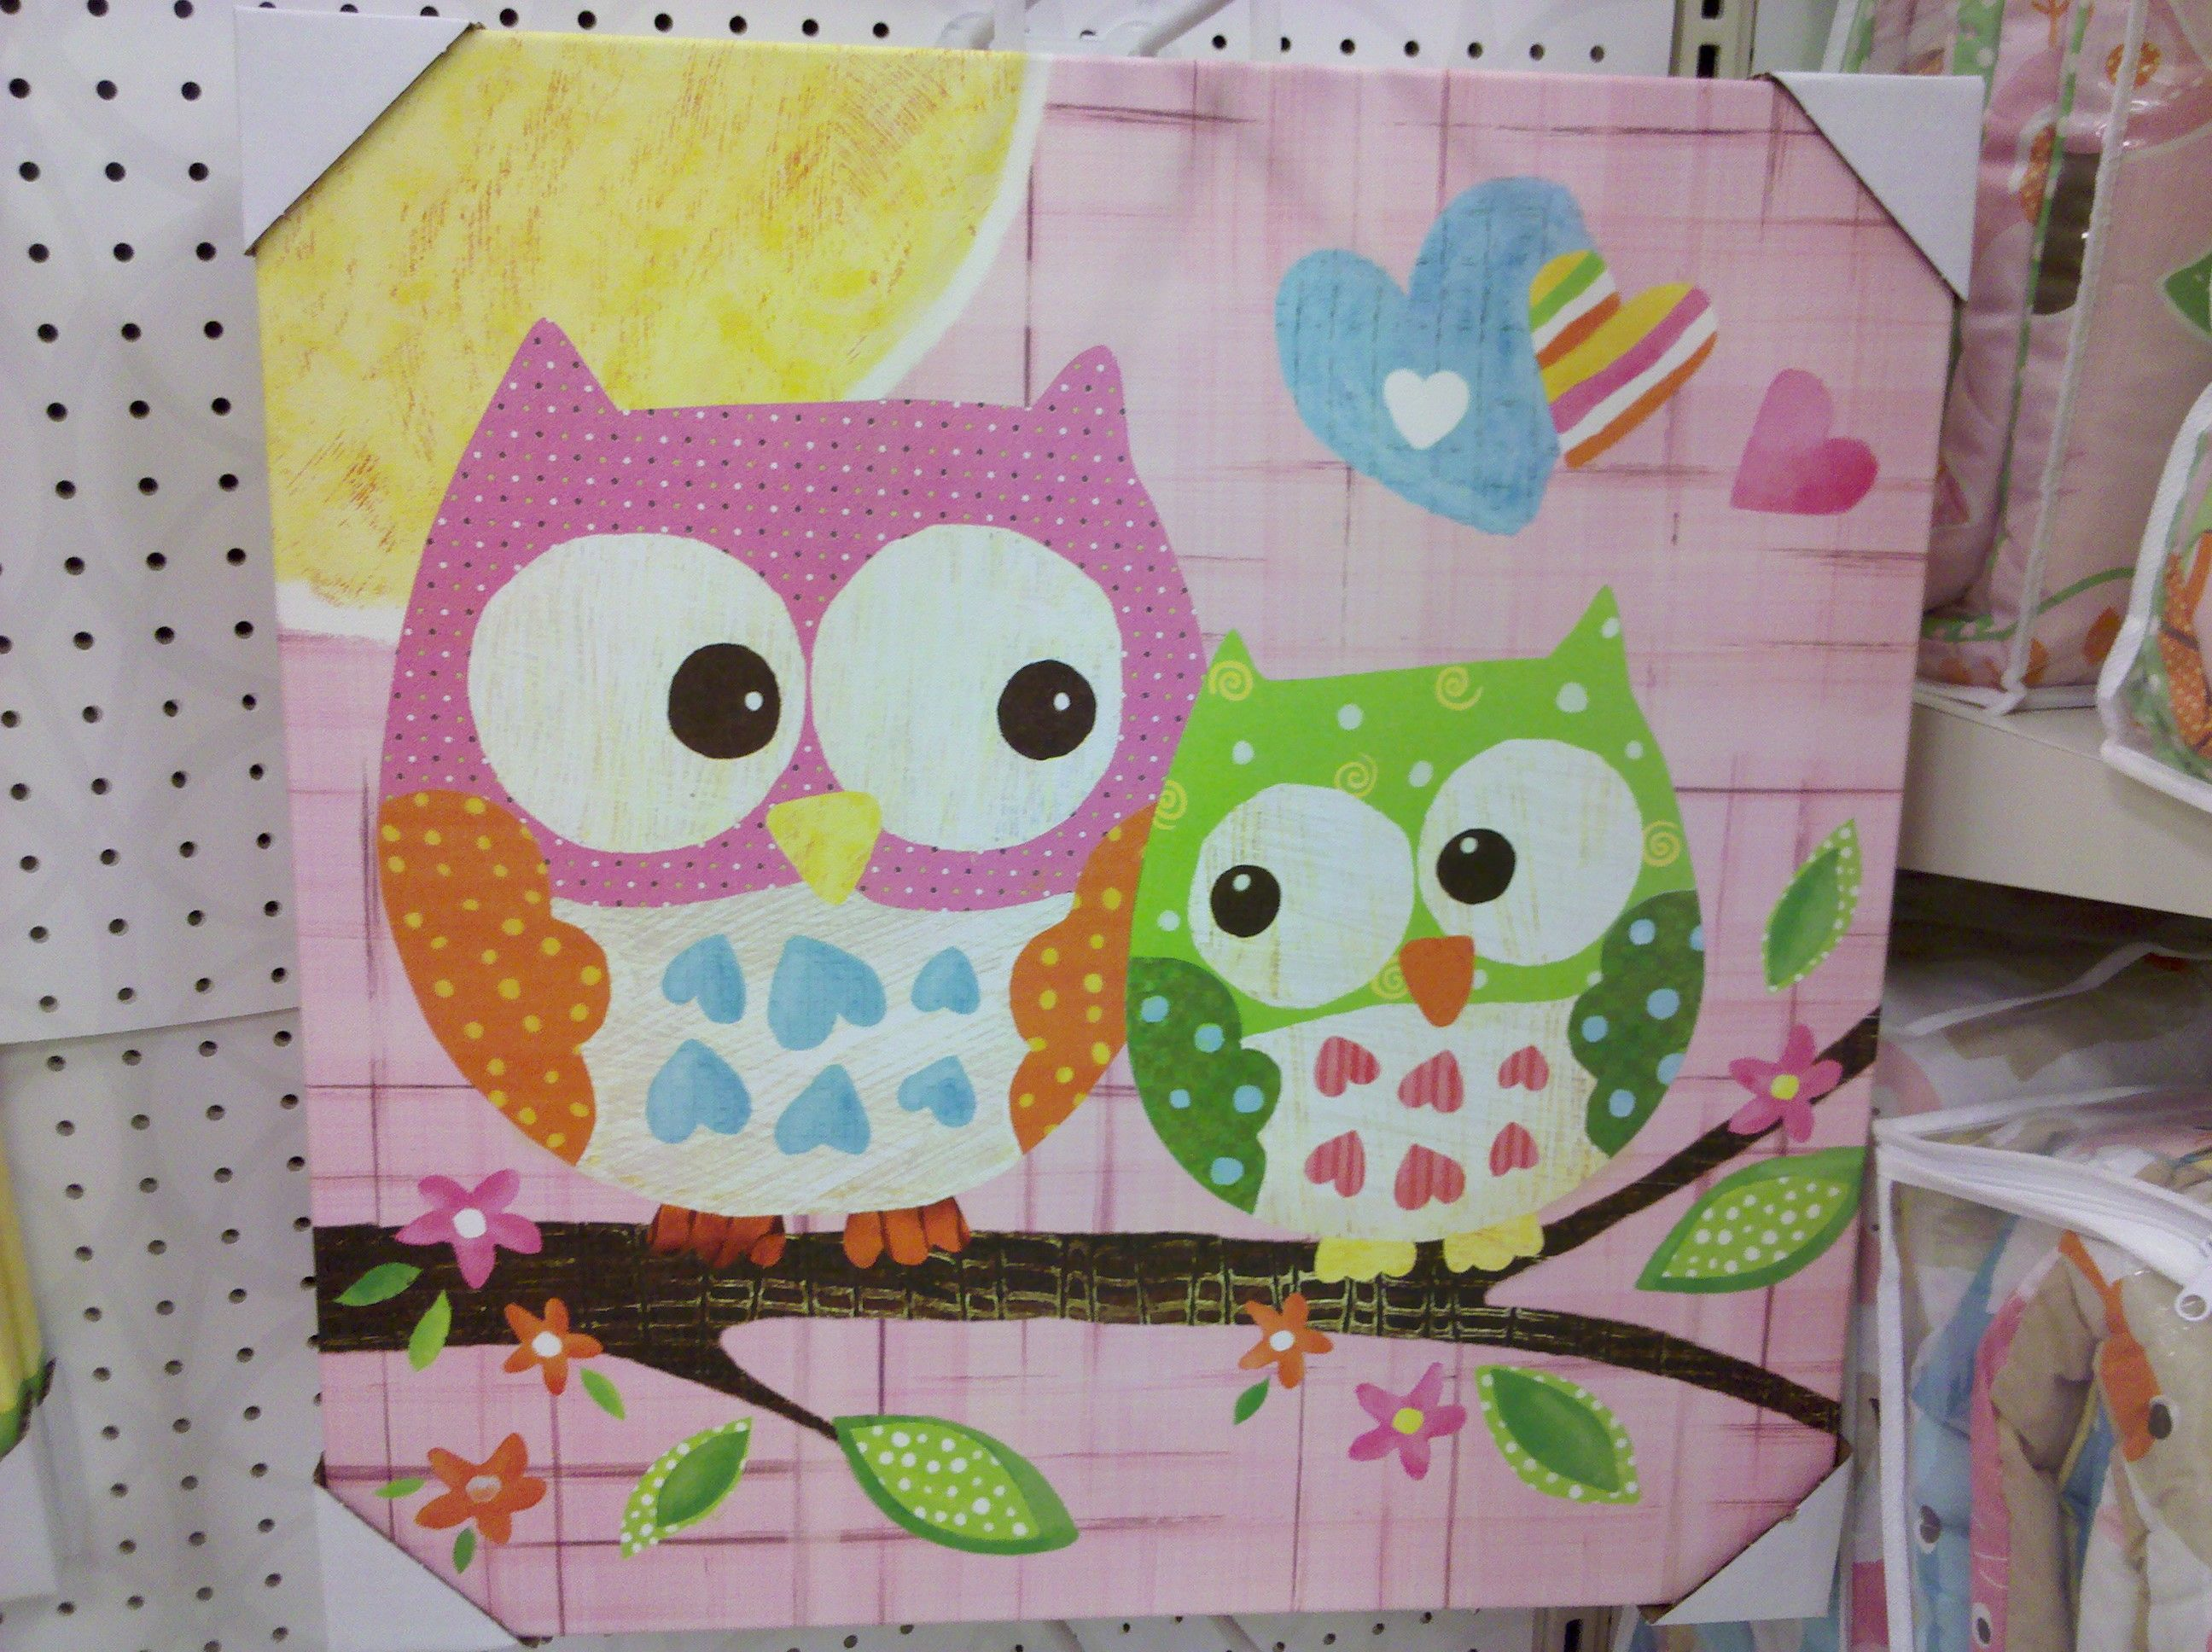 Target Oopsy Daisy Too Owl Wall Art